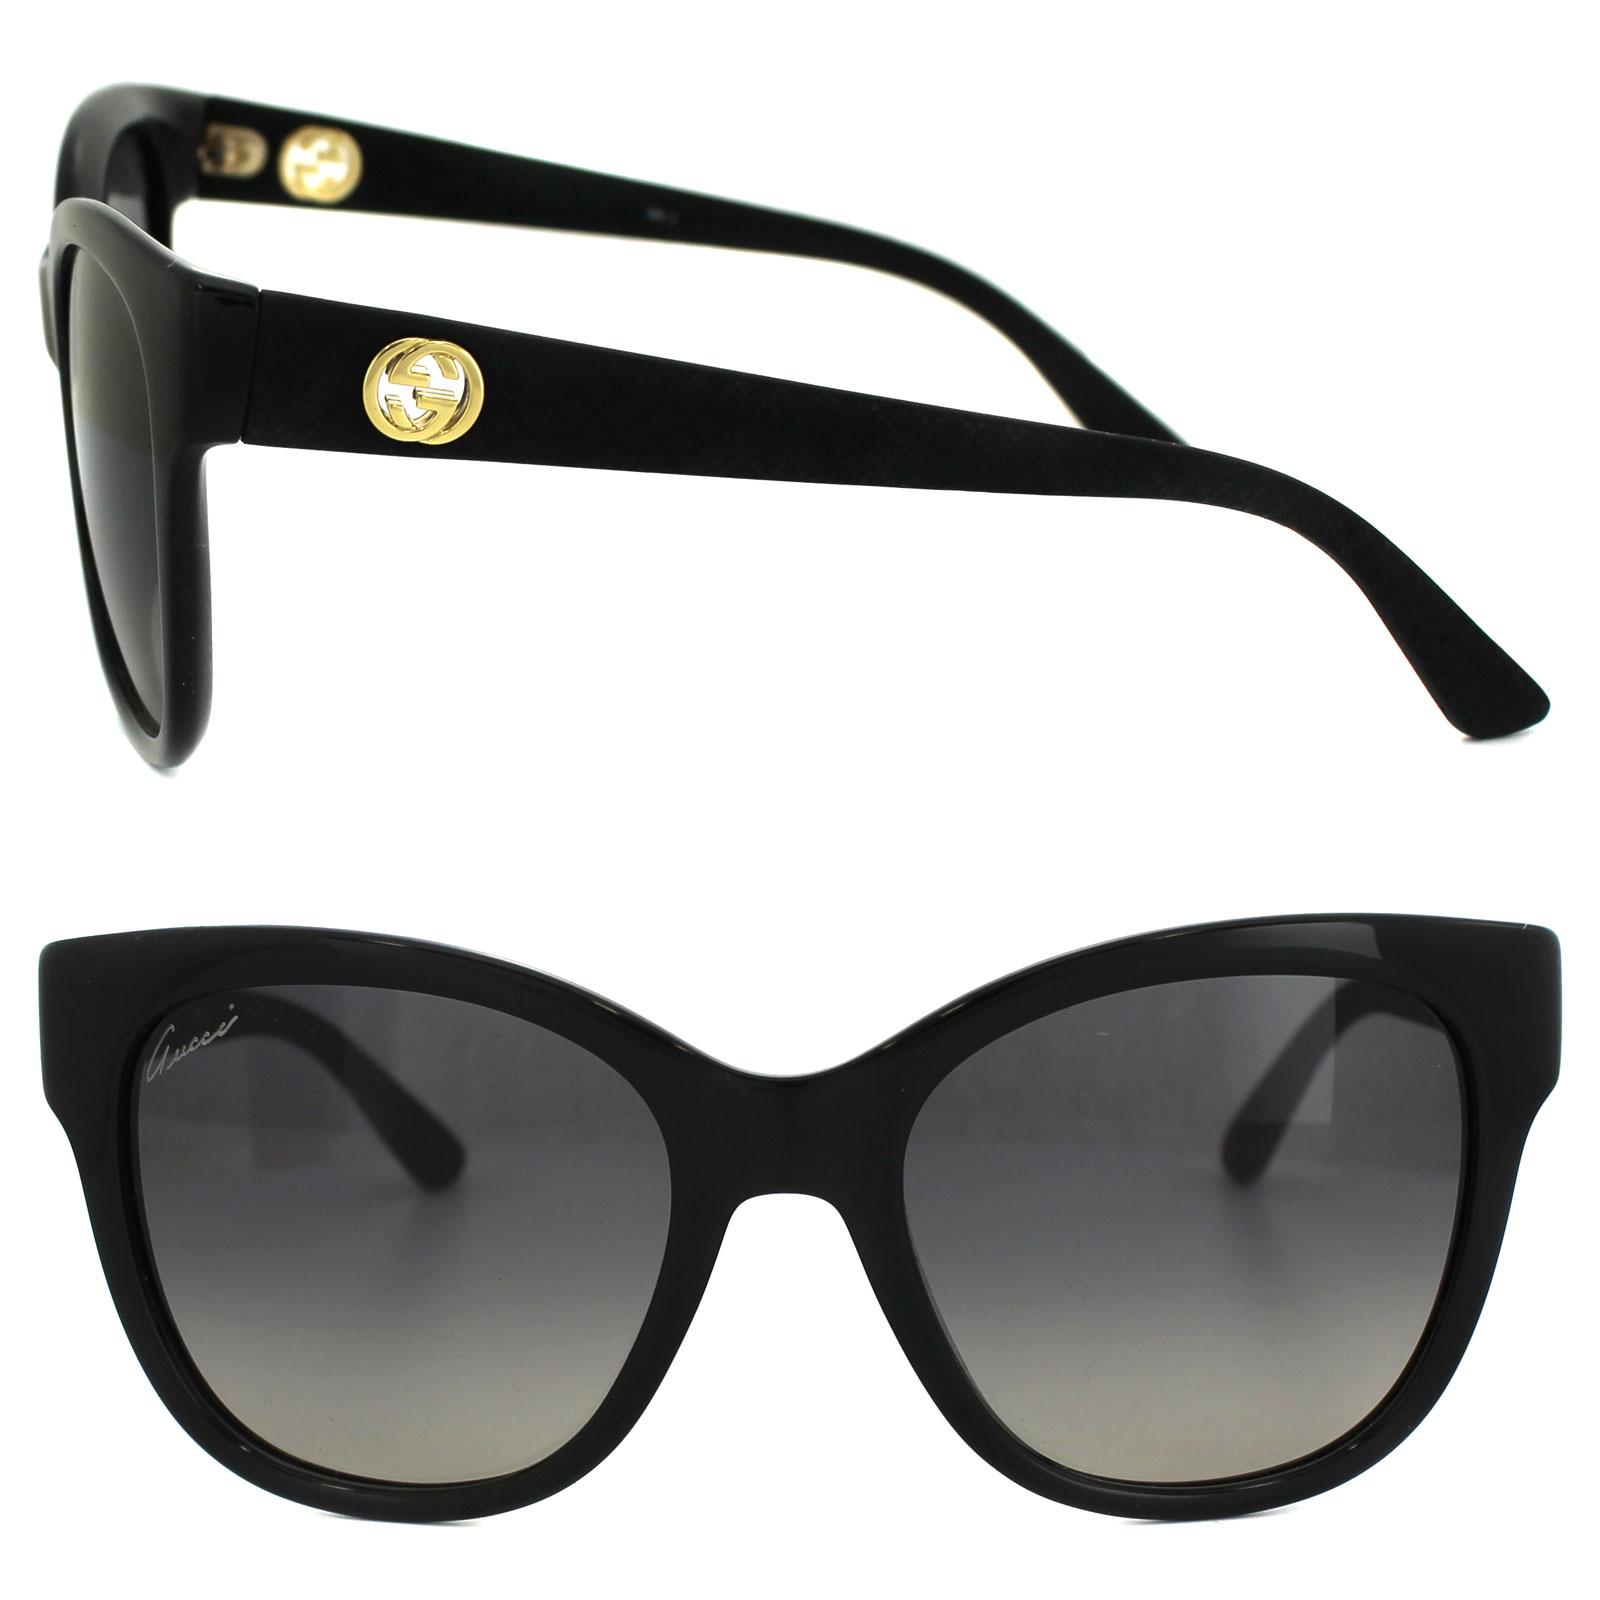 Cheap Gucci 3786 Sunglasses Discounted Sunglasses